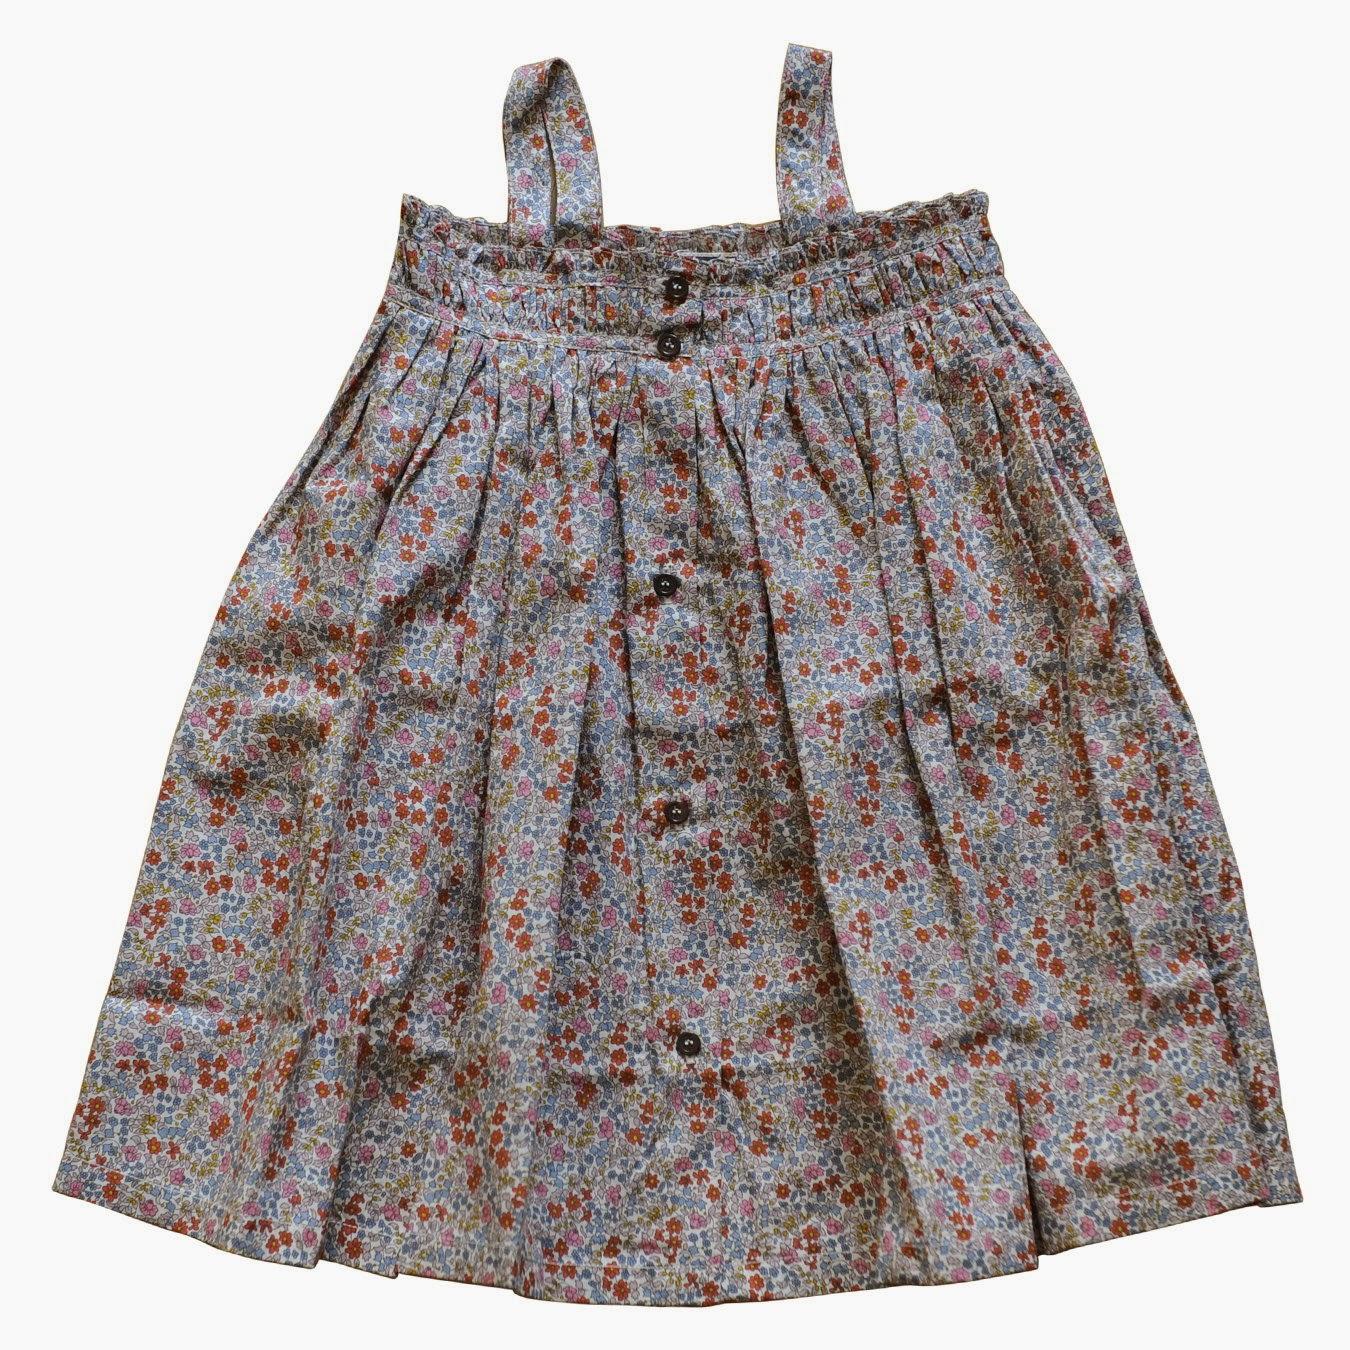 http://www.51starsparis.com/nouveautes/186-robe-bb-bretelle.html